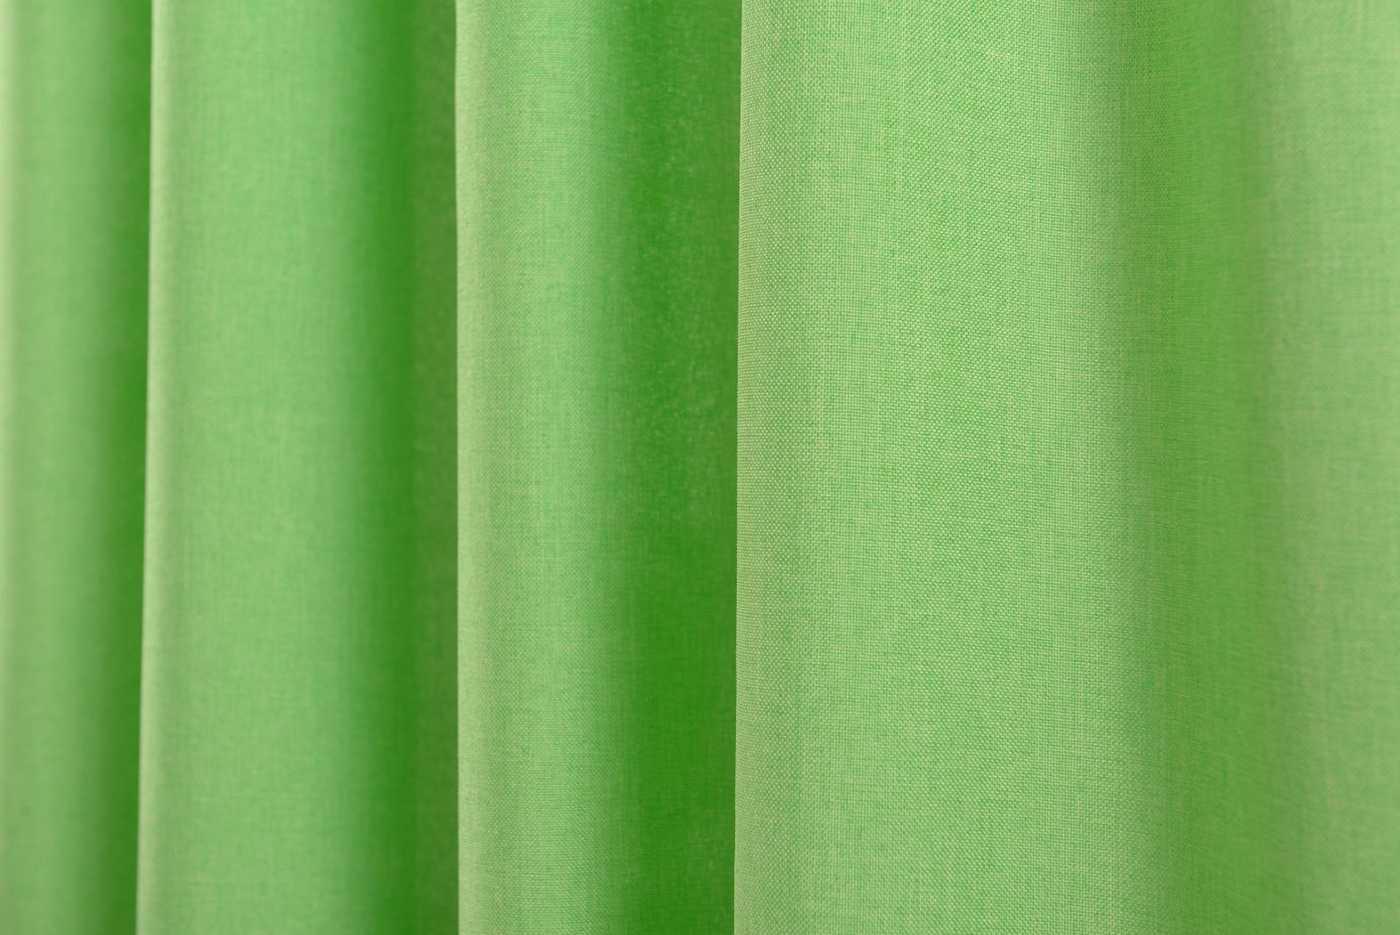 vorhang schlaufen cationic blickdicht leinen optik 2 st ck 245x140 gr n. Black Bedroom Furniture Sets. Home Design Ideas